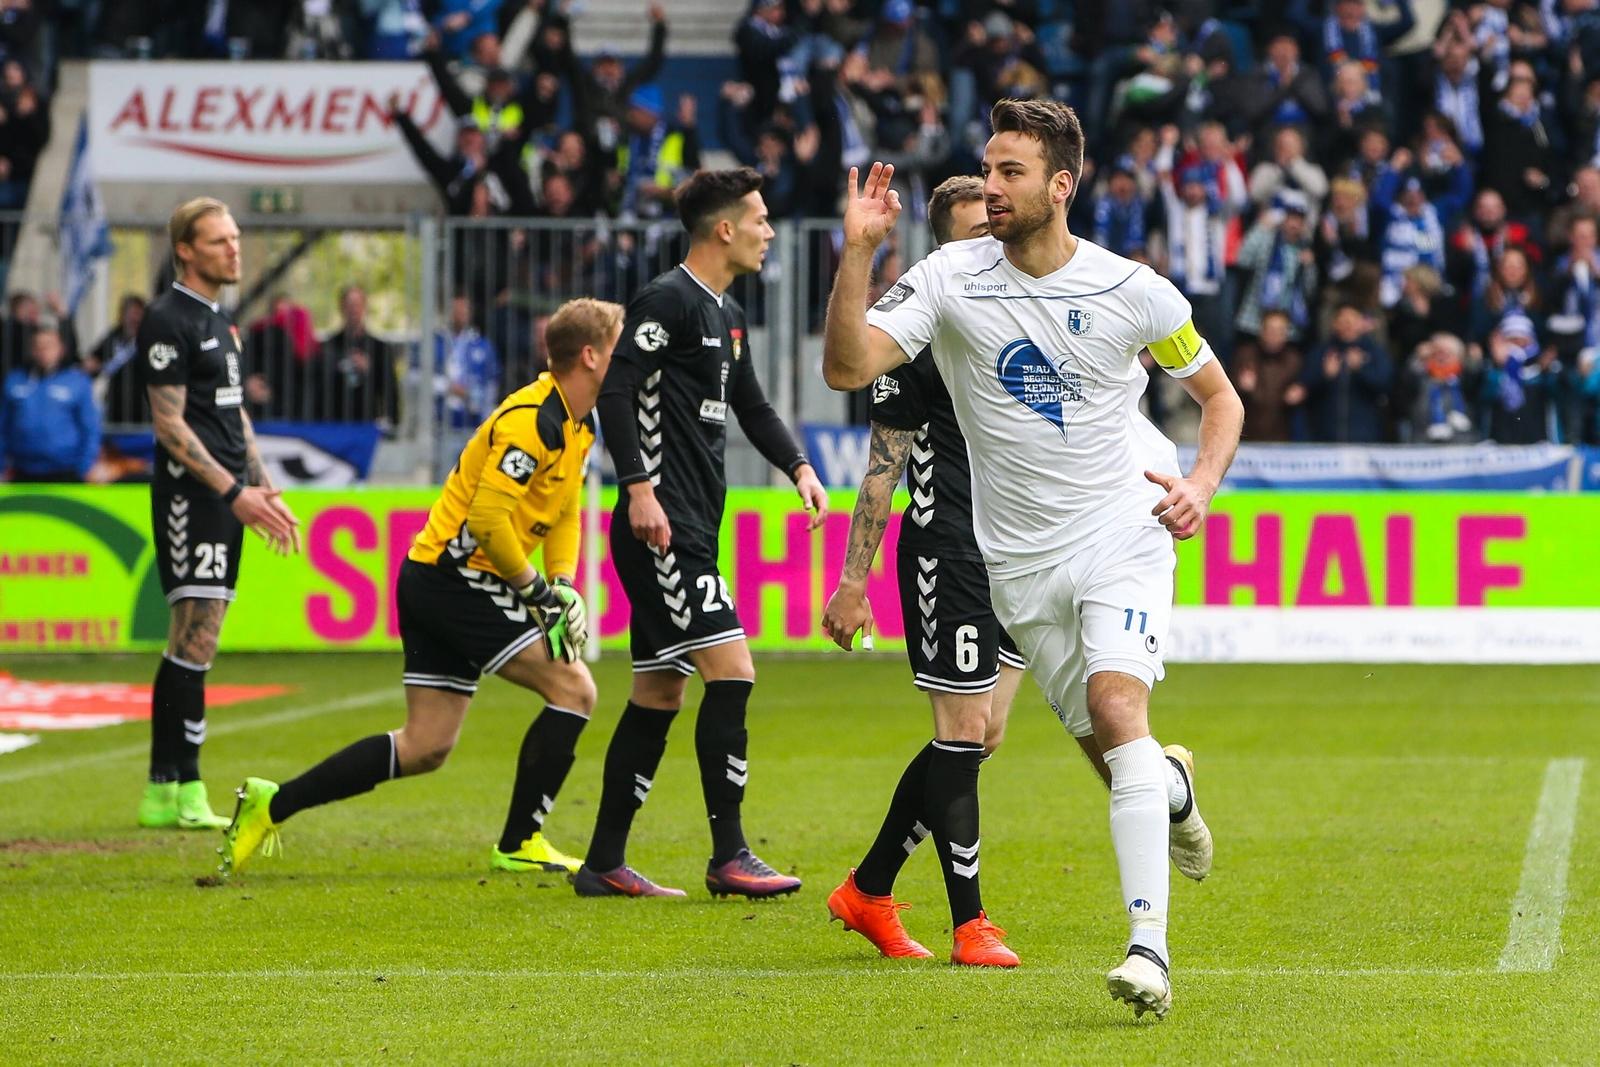 Christian Beck, Stürmer vom 1. FC Magdeburg